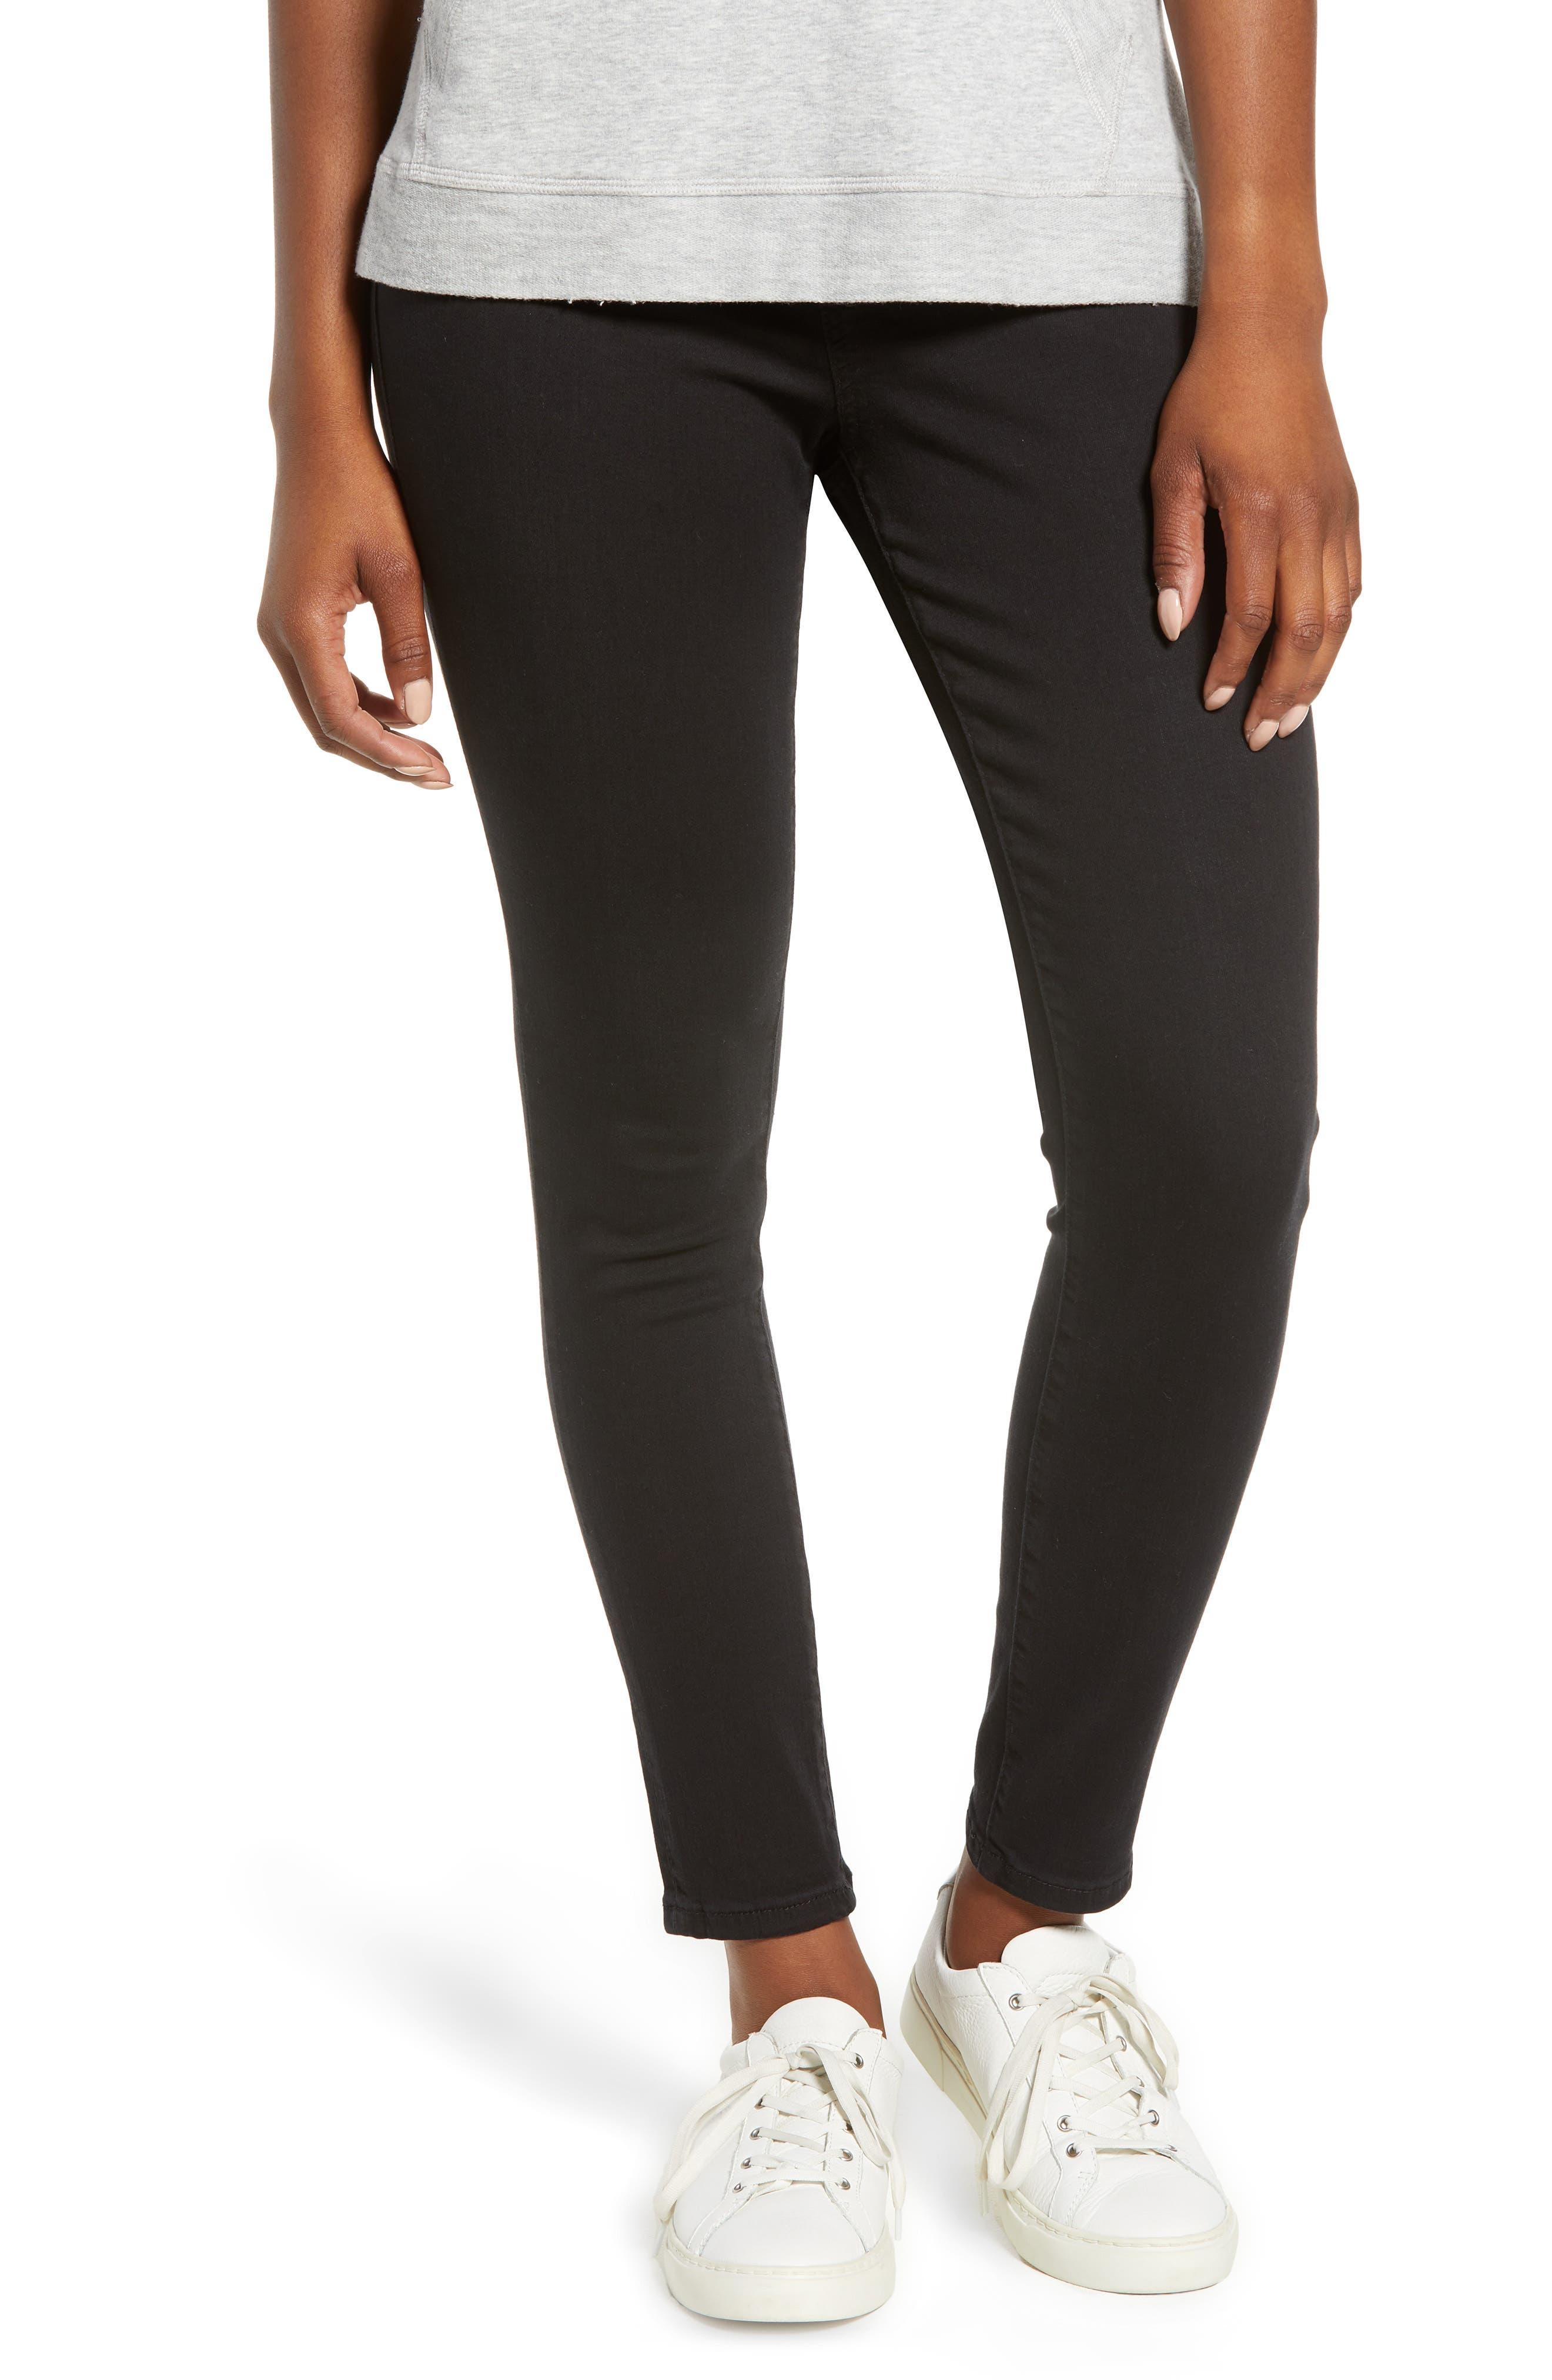 JAG JEANS Marla Stretch Denim Leggings, Main, color, BLACK